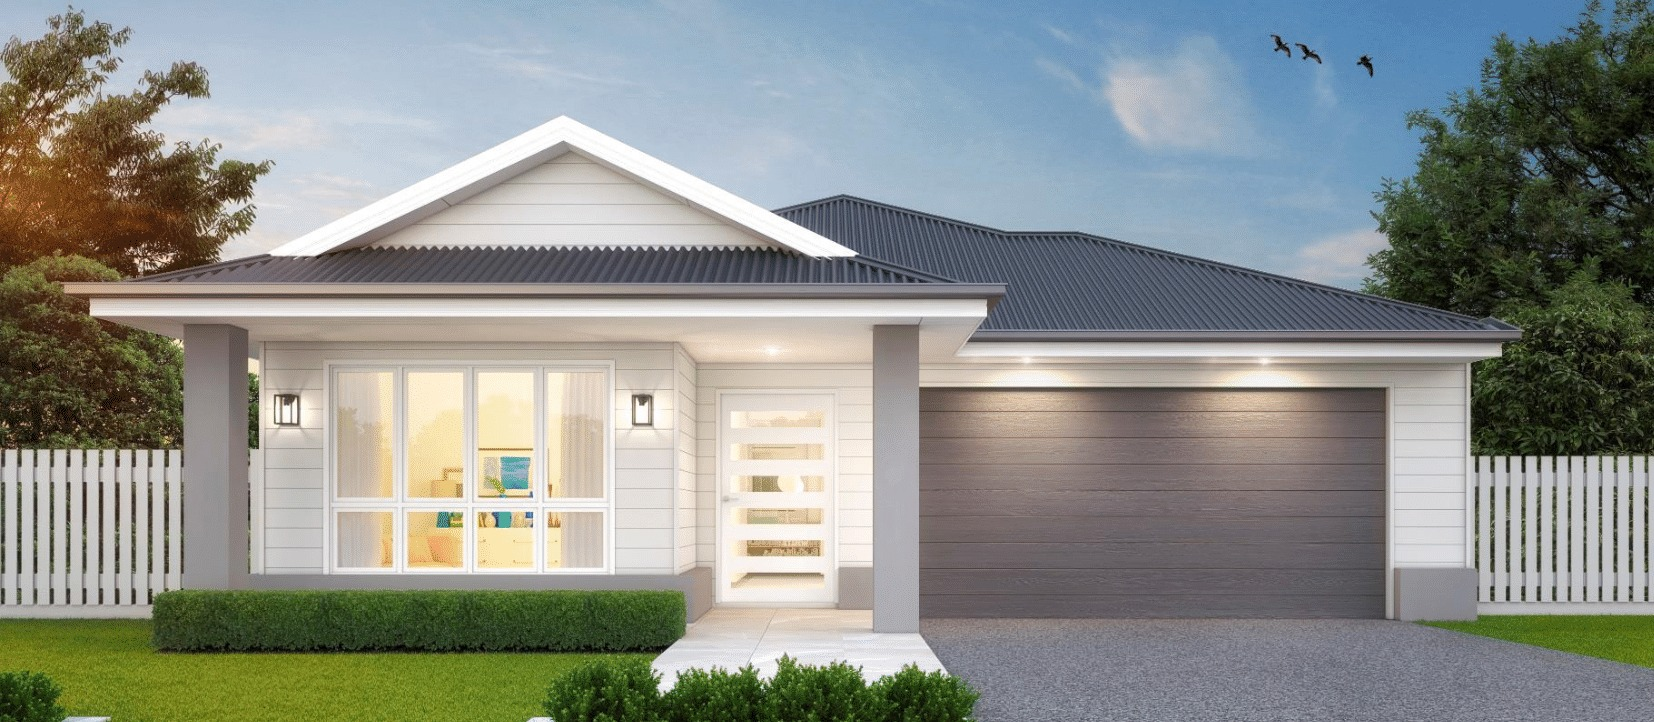 Lot 269 Sable Street, Ripley, QLD 4306